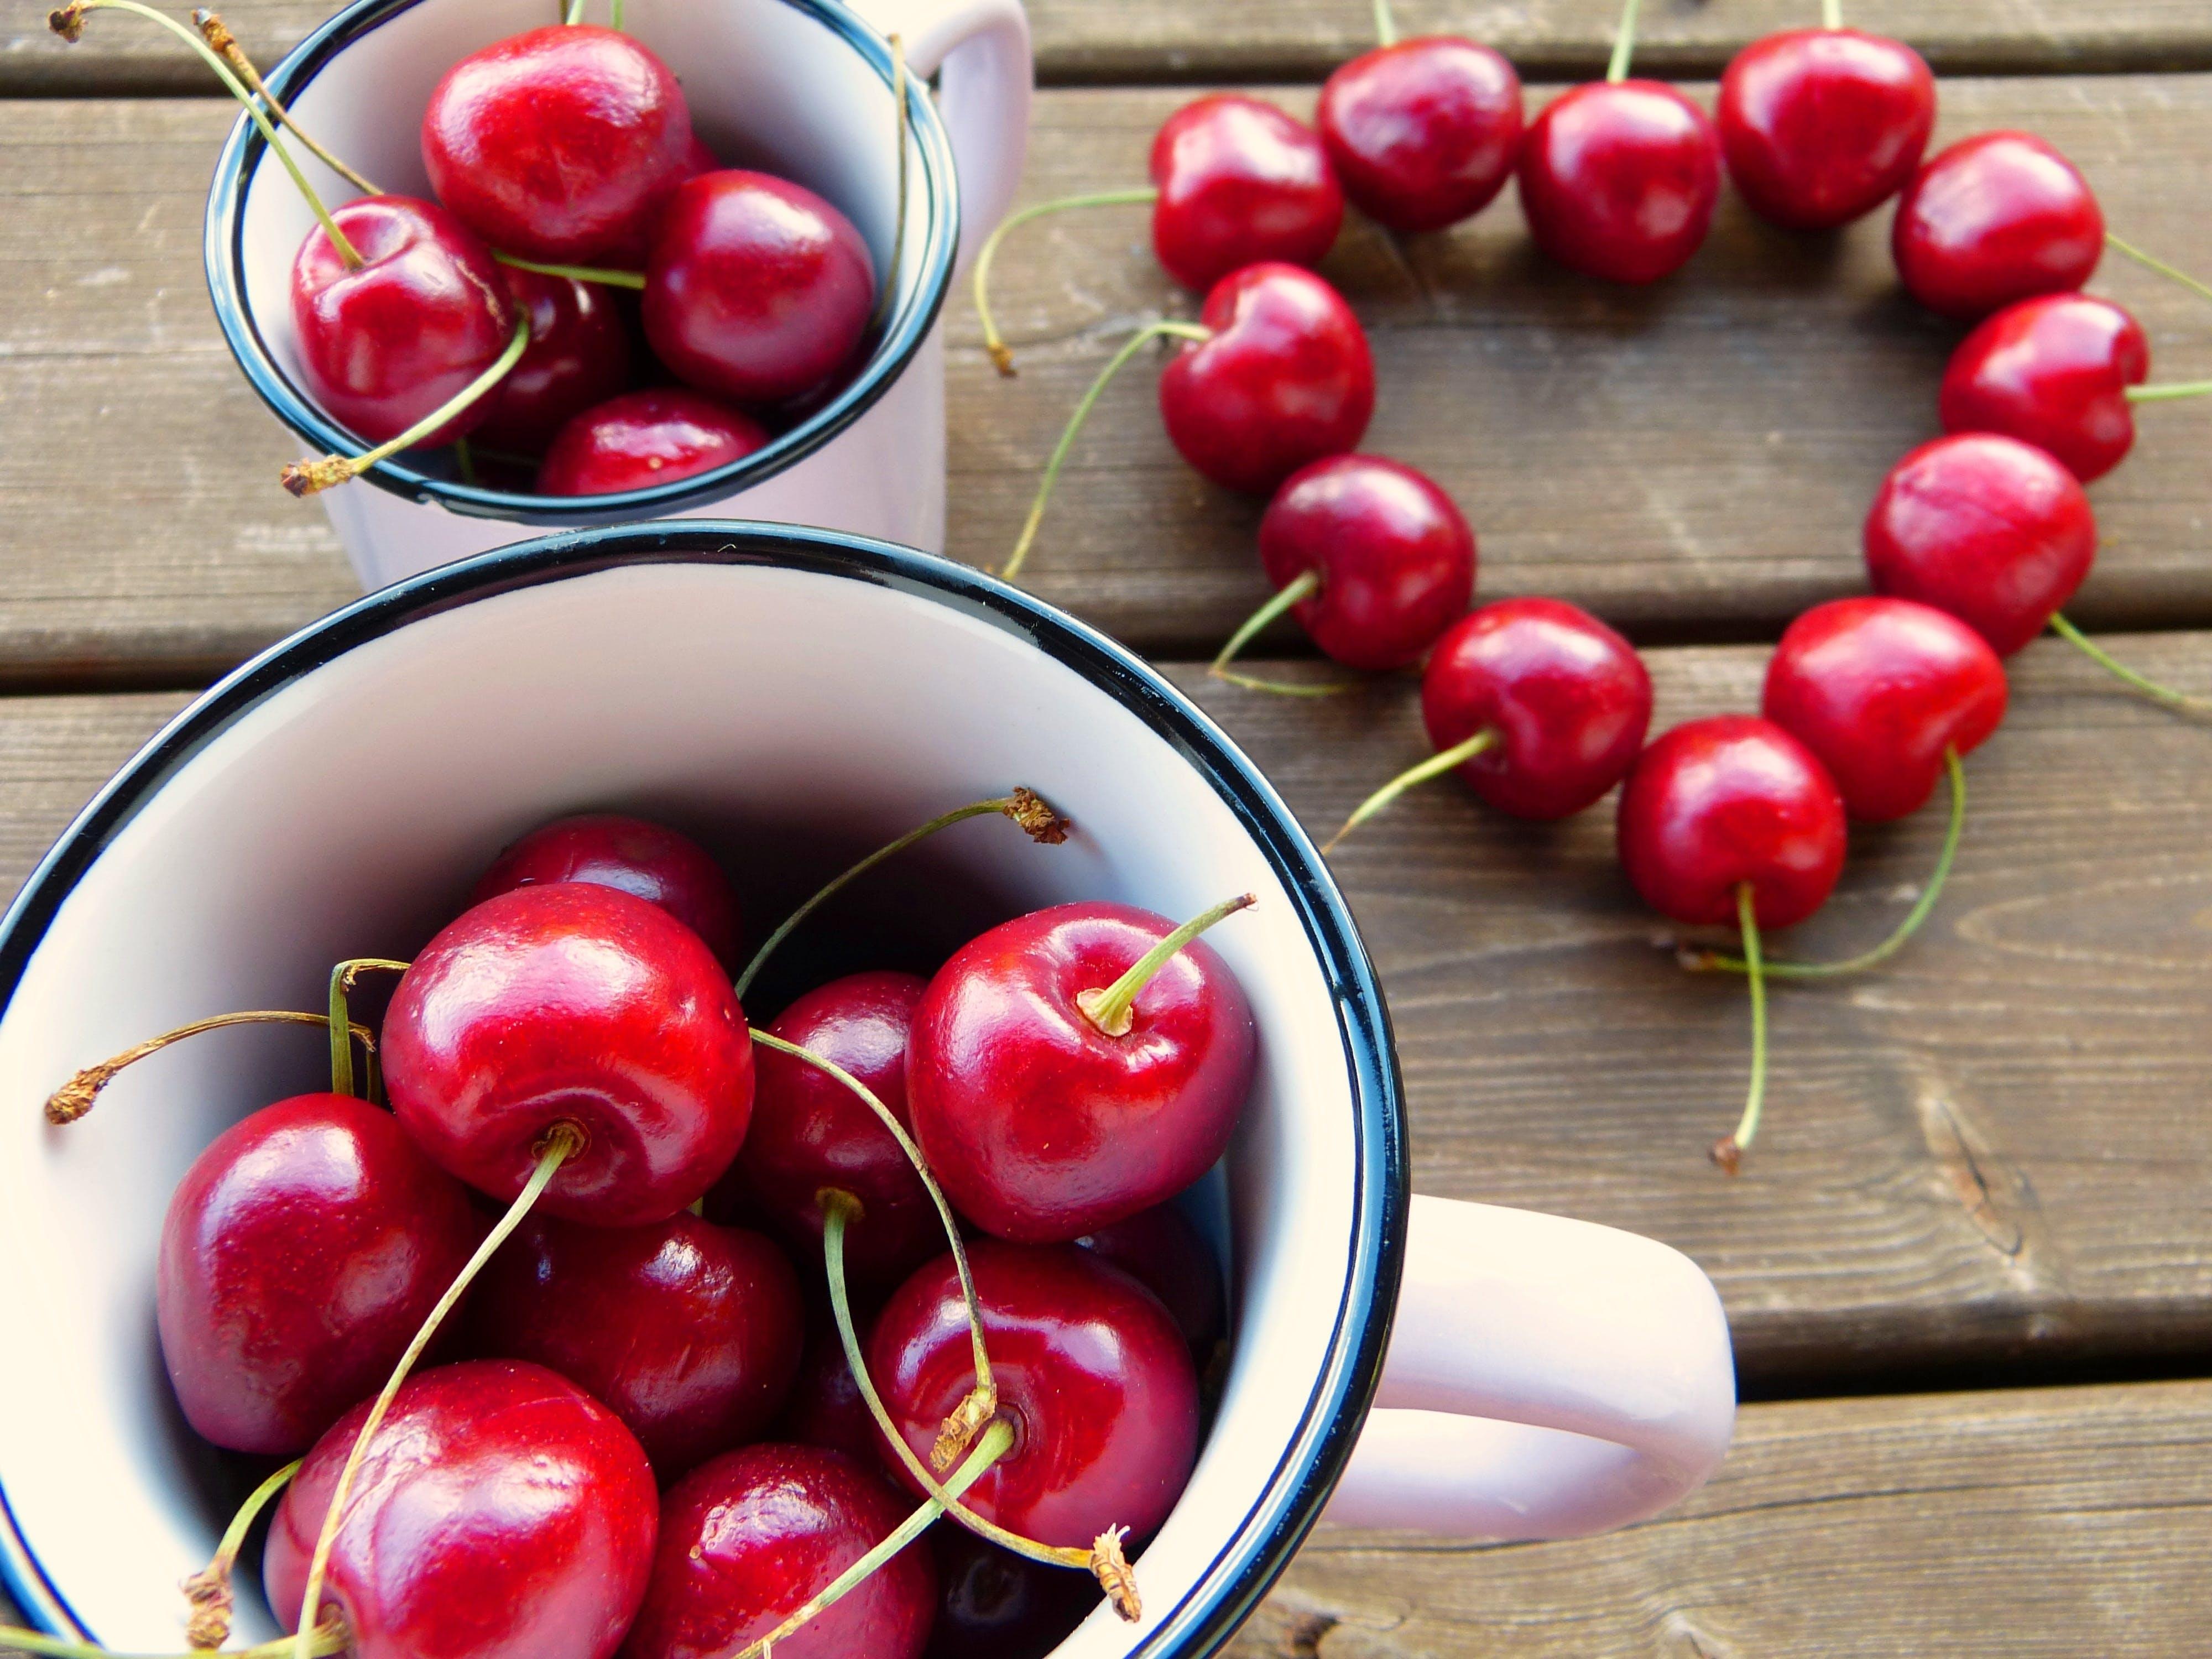 blur, cherries, close-up